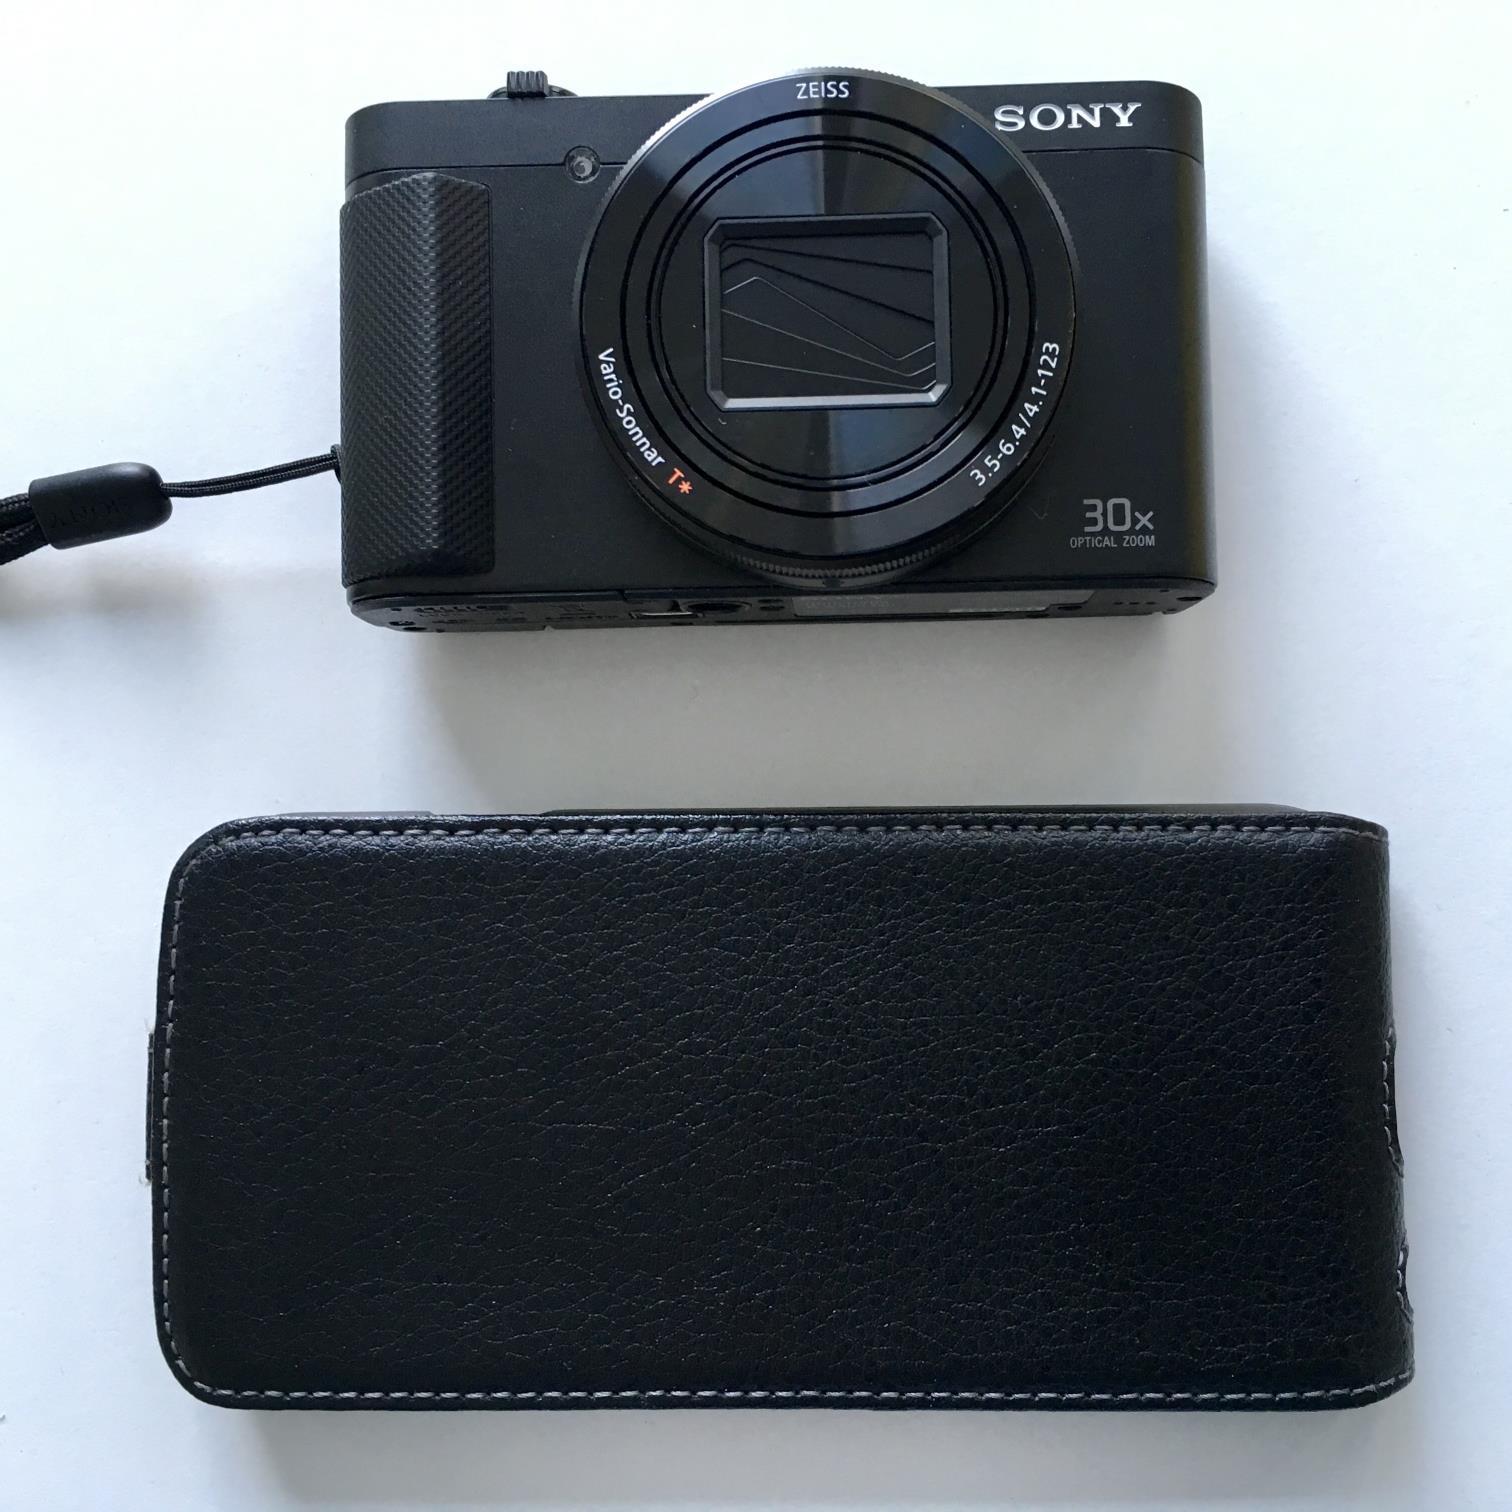 Sony DSC-HX90 vs iPhone 6s